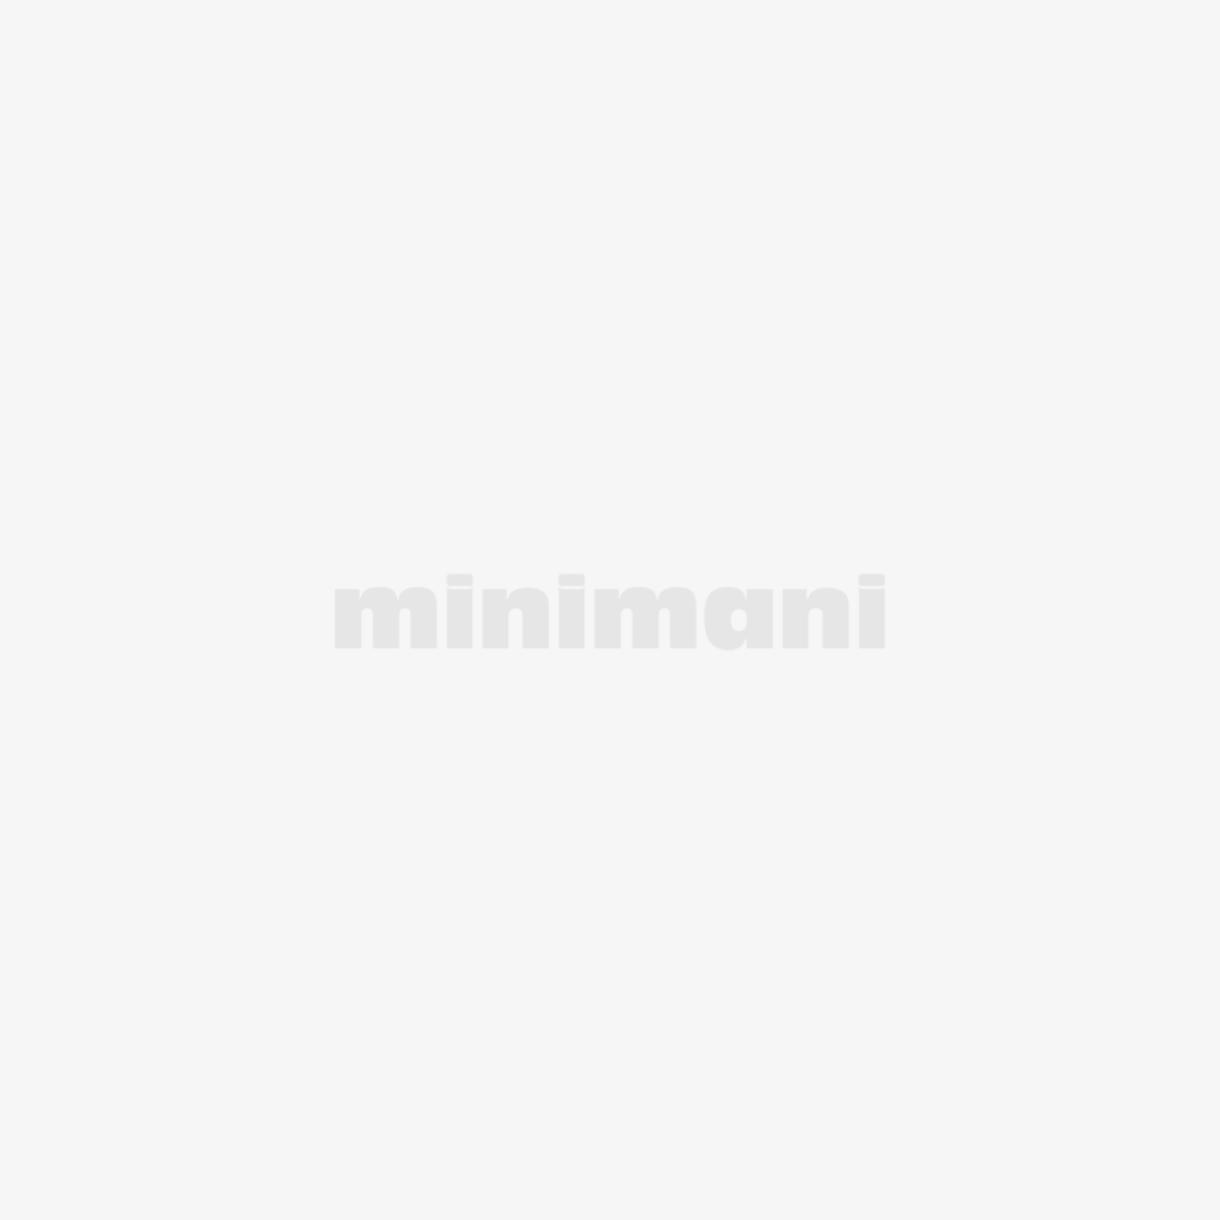 M-FILTER ILMANSUODATIN  MAP 6900 MAZDA 626 92-